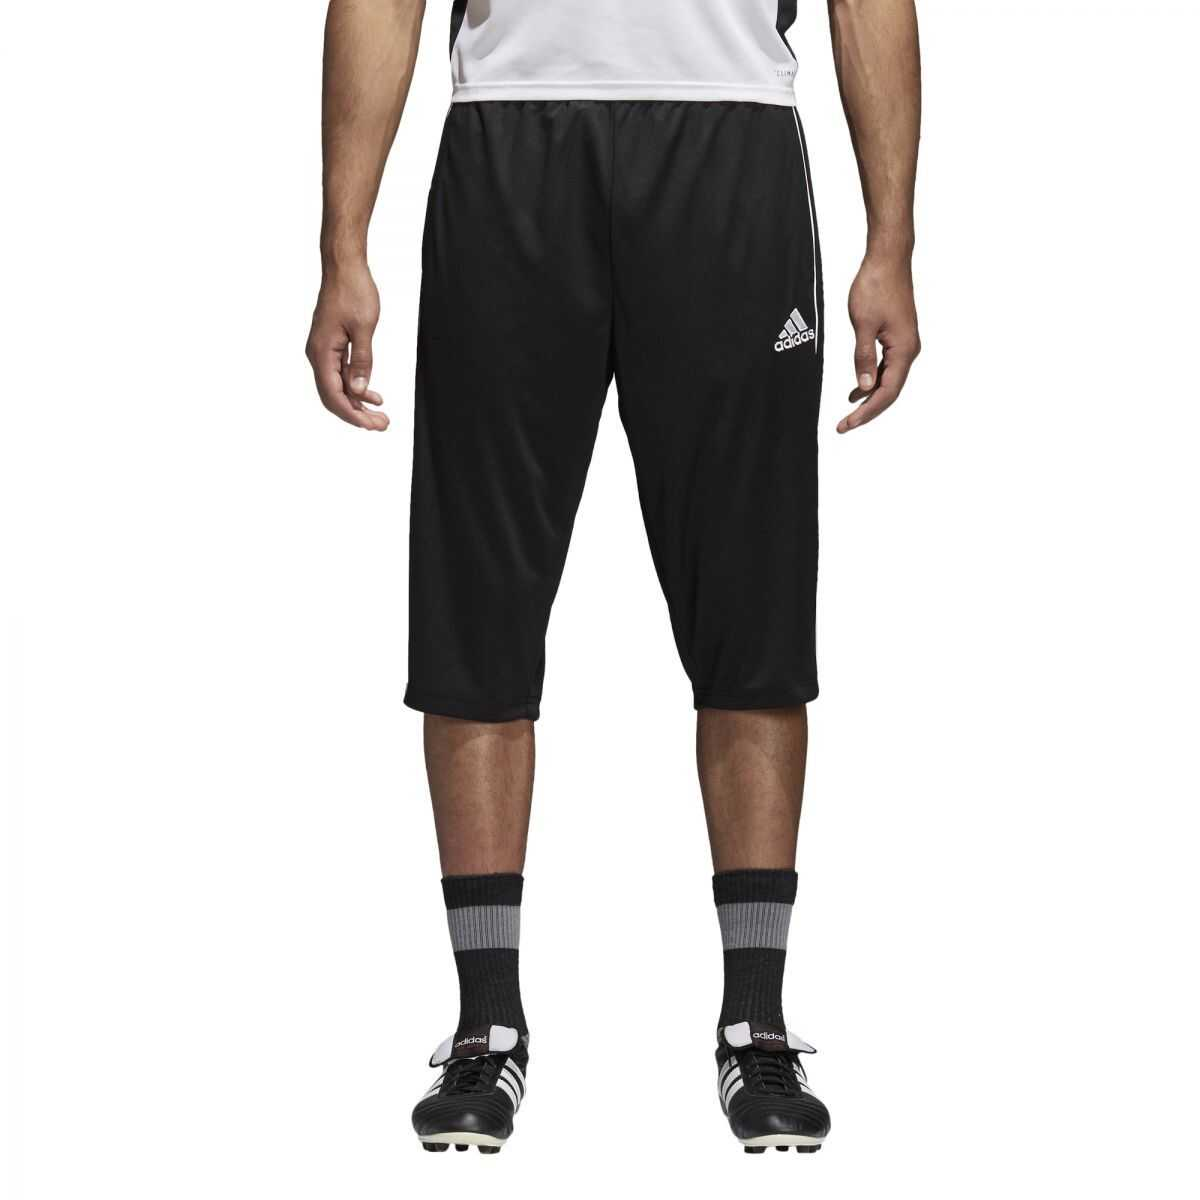 adidas CORE18 3/4 PNT BLACK/WHITE